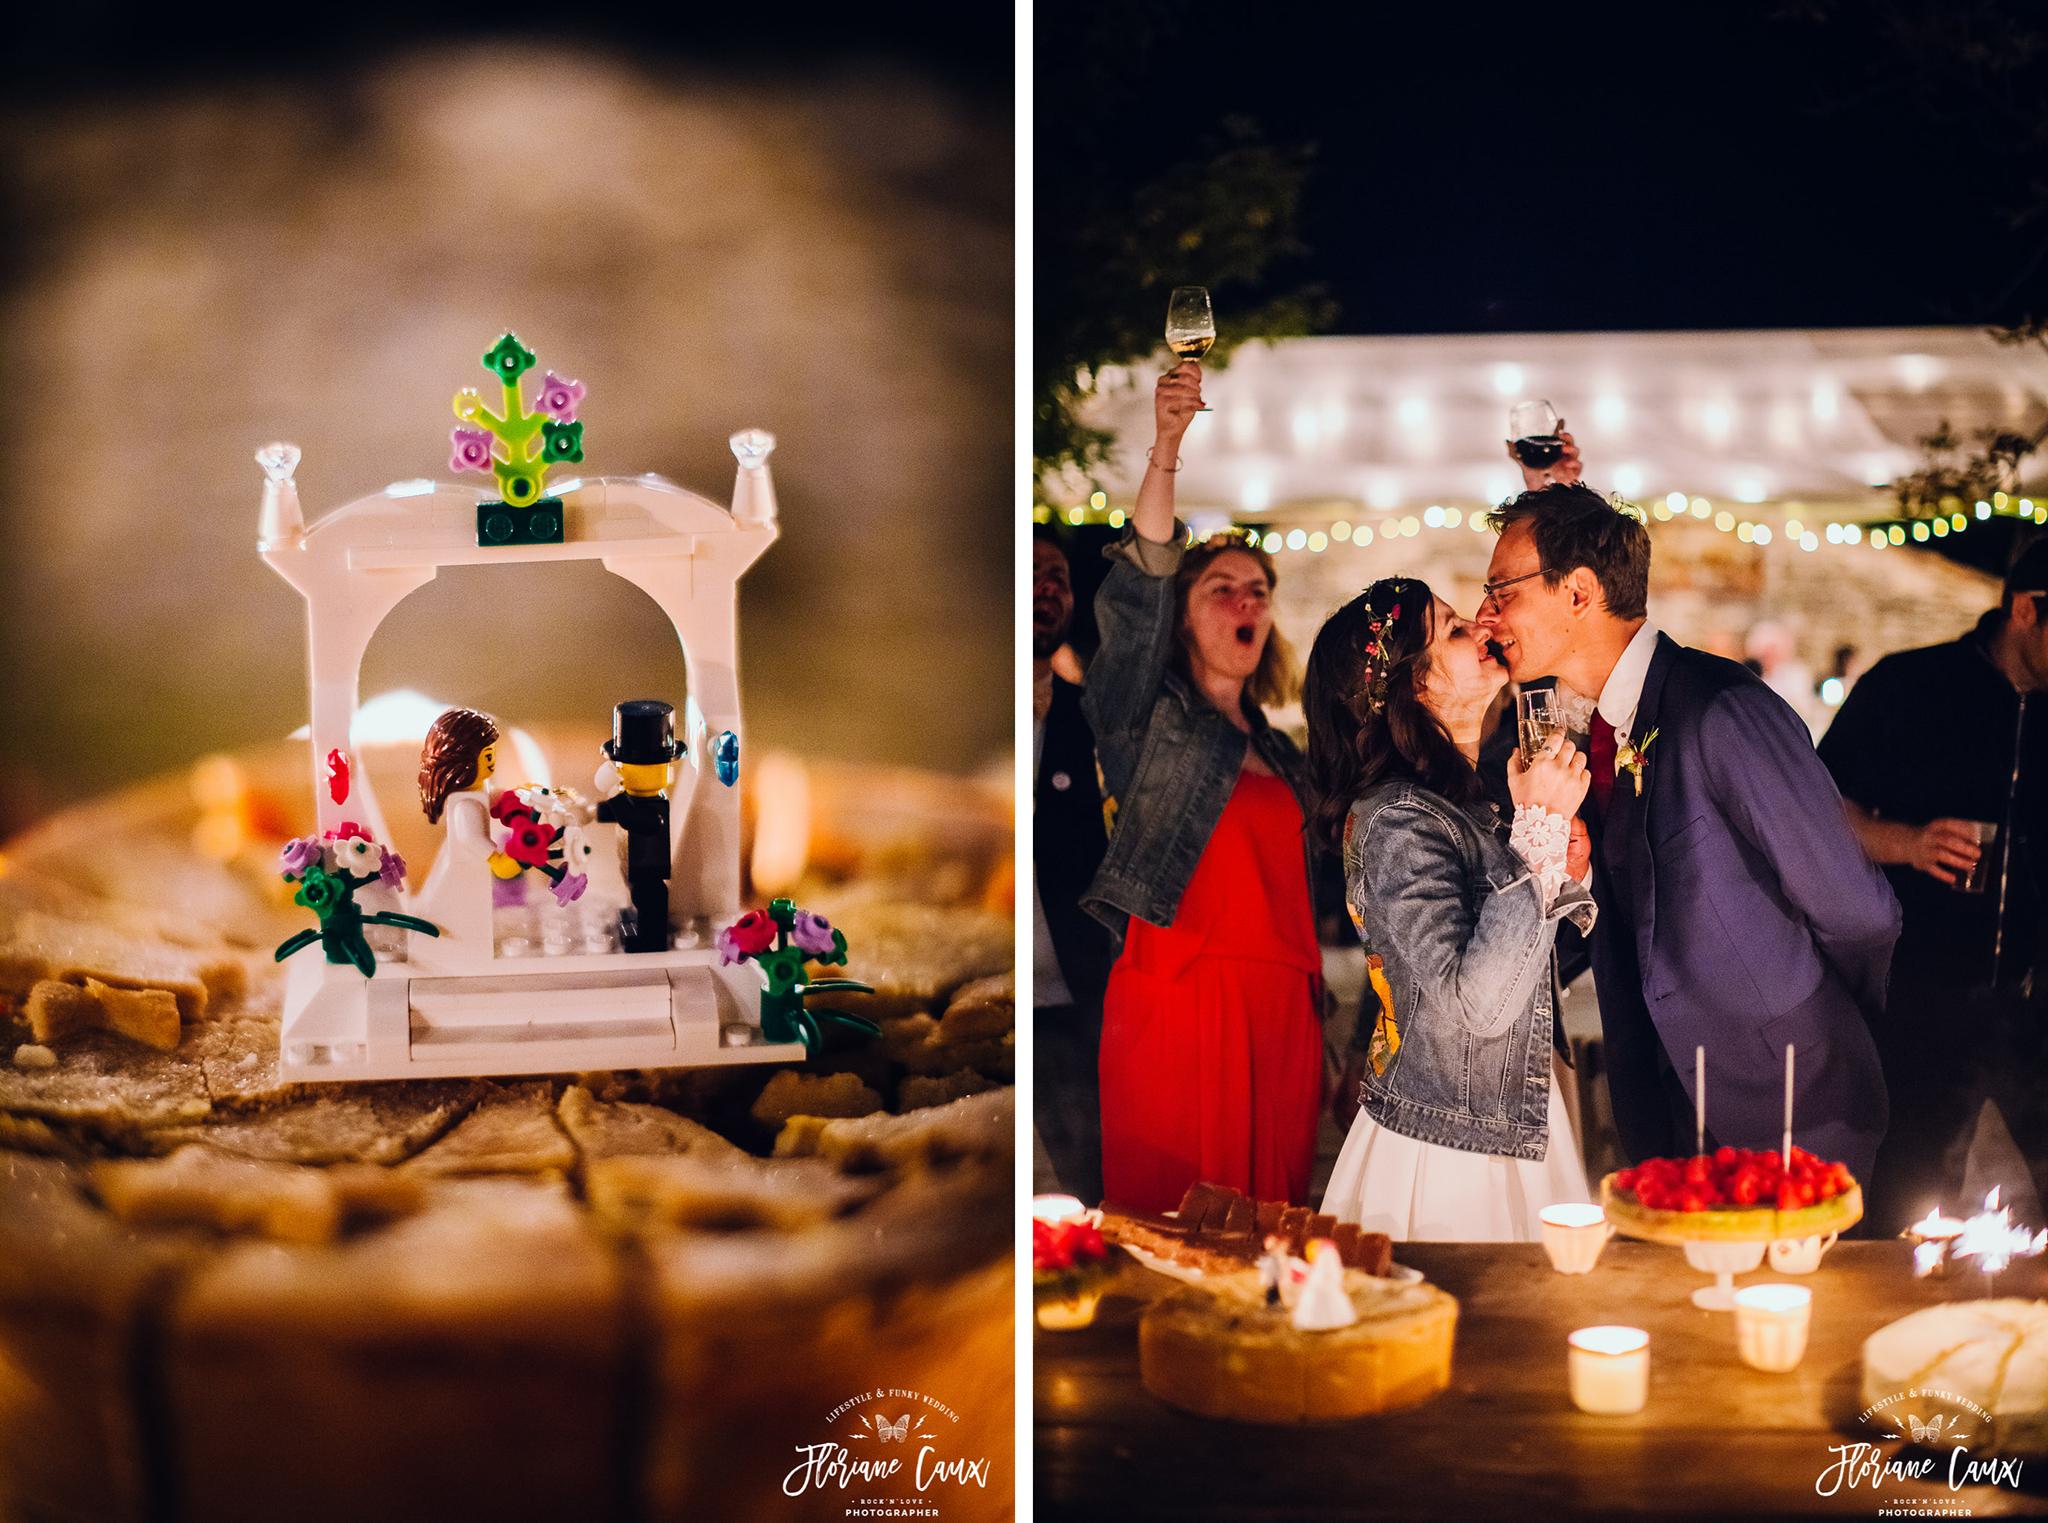 my-dear-festival-party-mariage-chez-soi-11